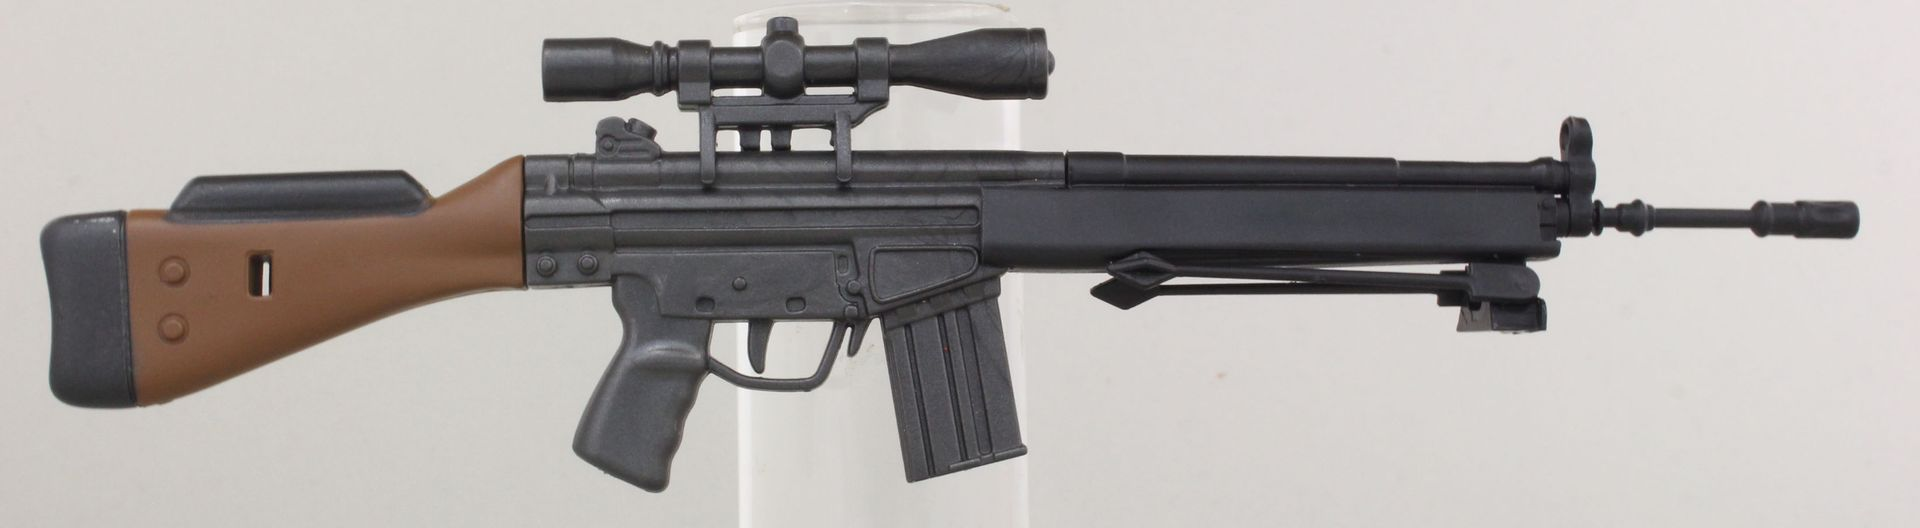 G3SG-1 狙撃仕様モデル